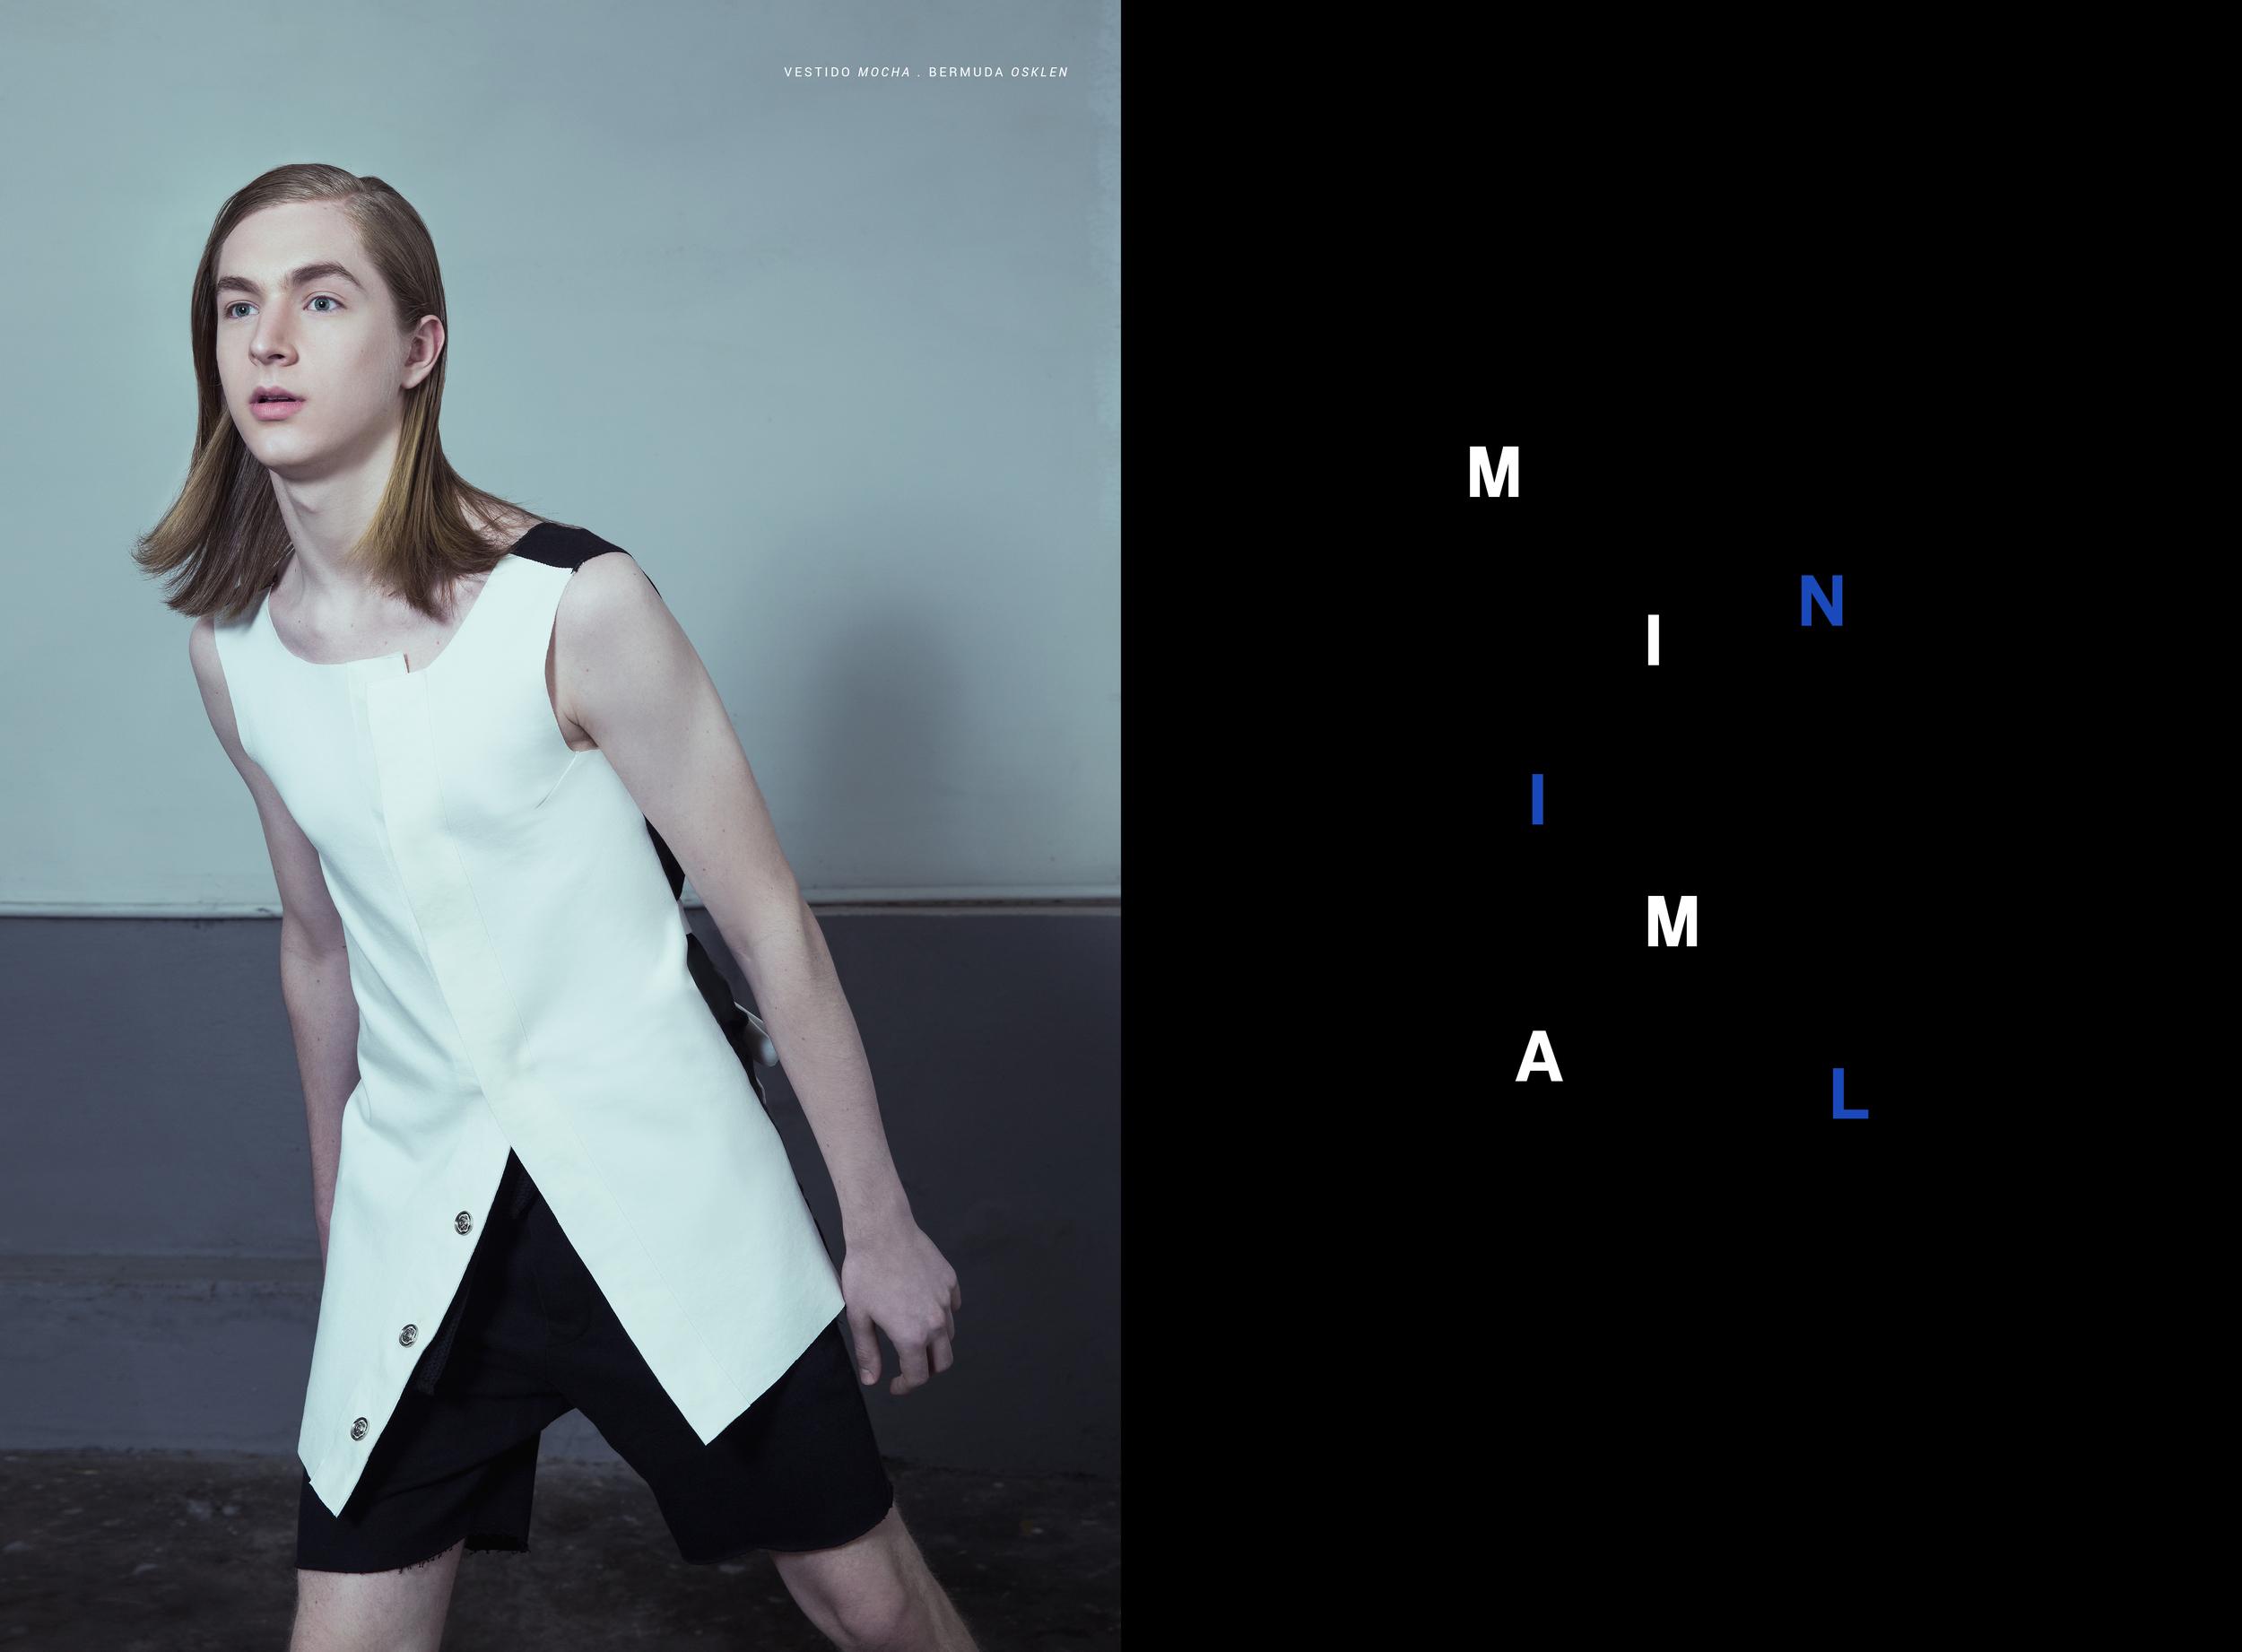 editorial-minimal-final-dupla5.jpg